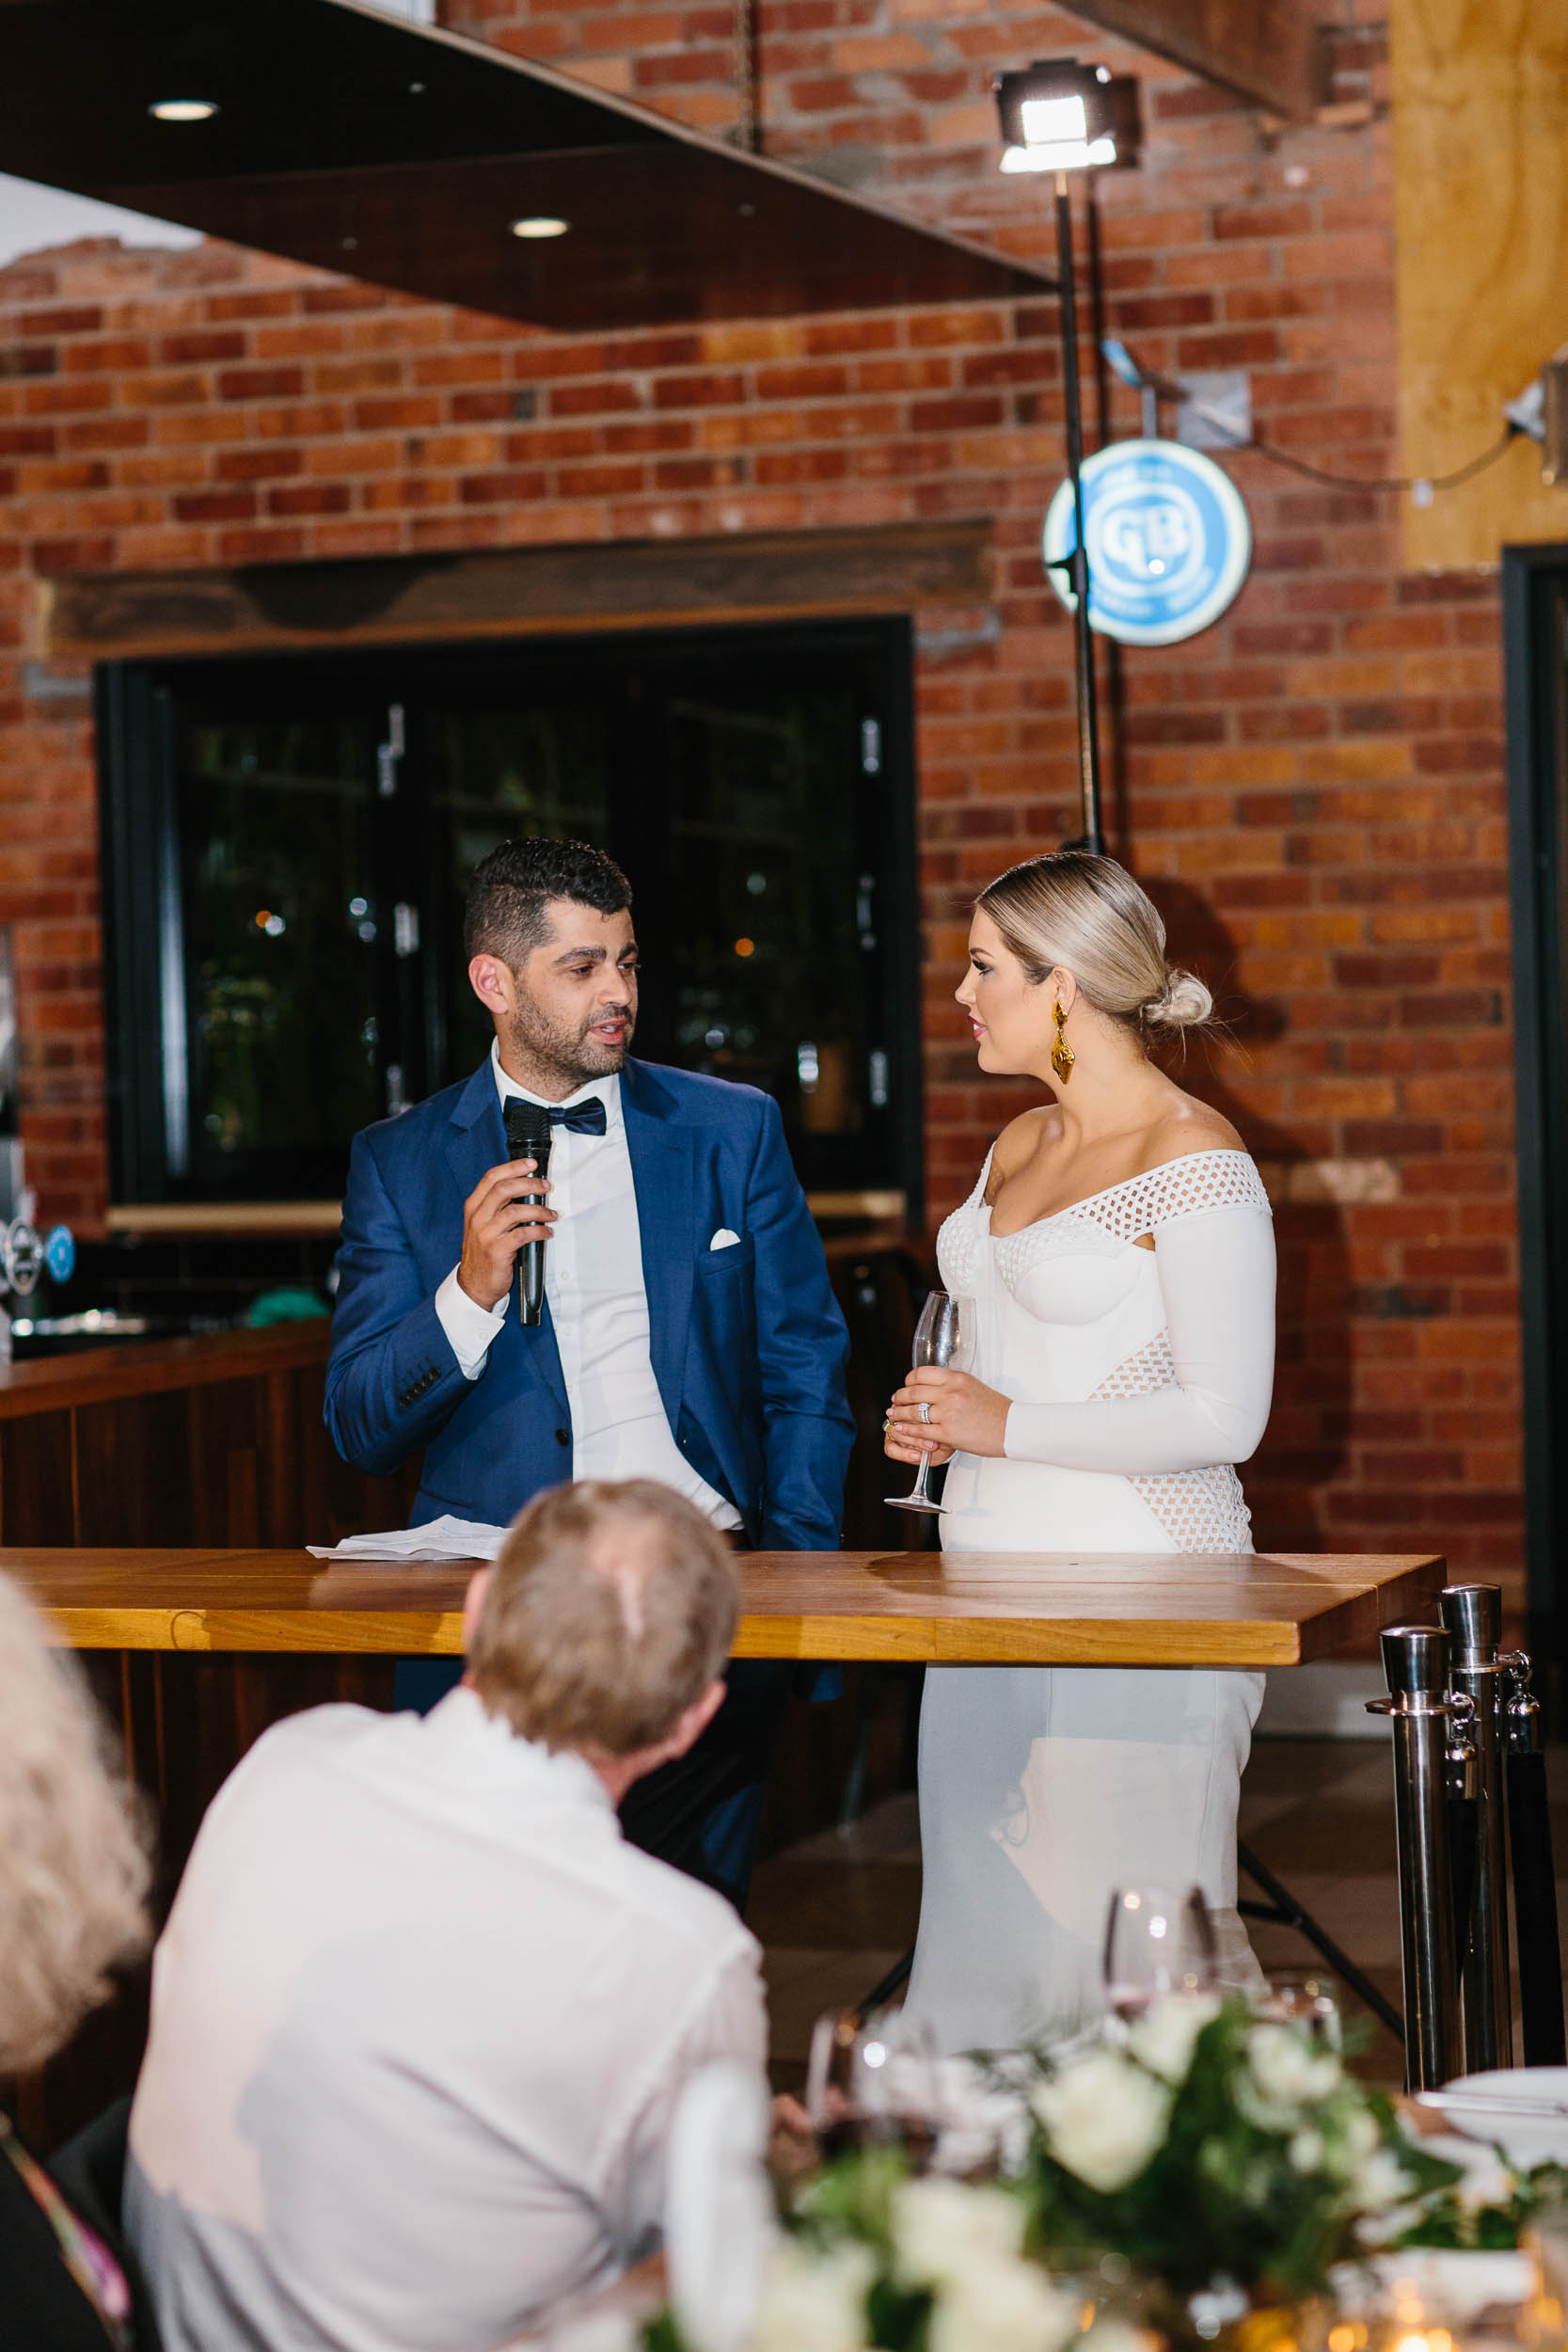 Kas-Richards-Urban-Melbourne-Wedding-Jason-Grech-761.jpg